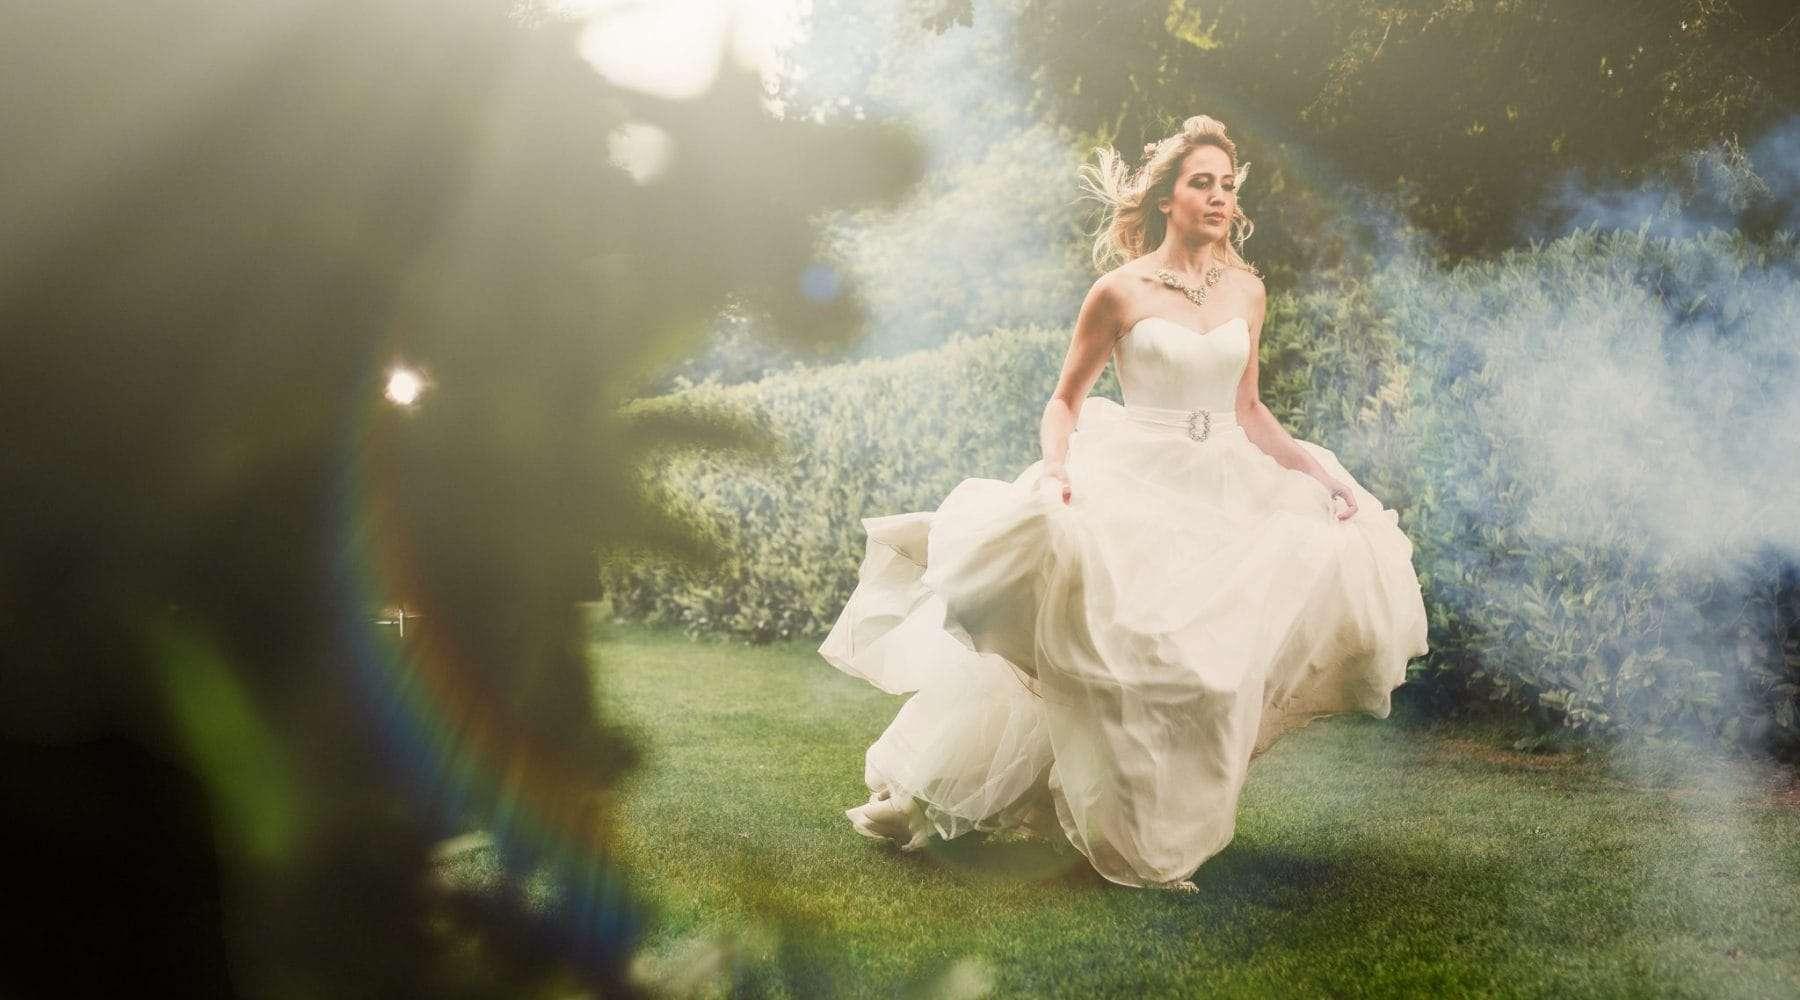 Modern Romantic Bride at Larmertree, Annasul Y, Lyn Ashworth, Larmer Tree Gardens, Winchester wedding dress shop, hampshire bridal boutique, berkshire, reading, newbury, salisbury, wiltshire, surrey, west sussex, dorset, bournemouth, southampton, portsmouth, basingstoke, andover, bournemouth, poole